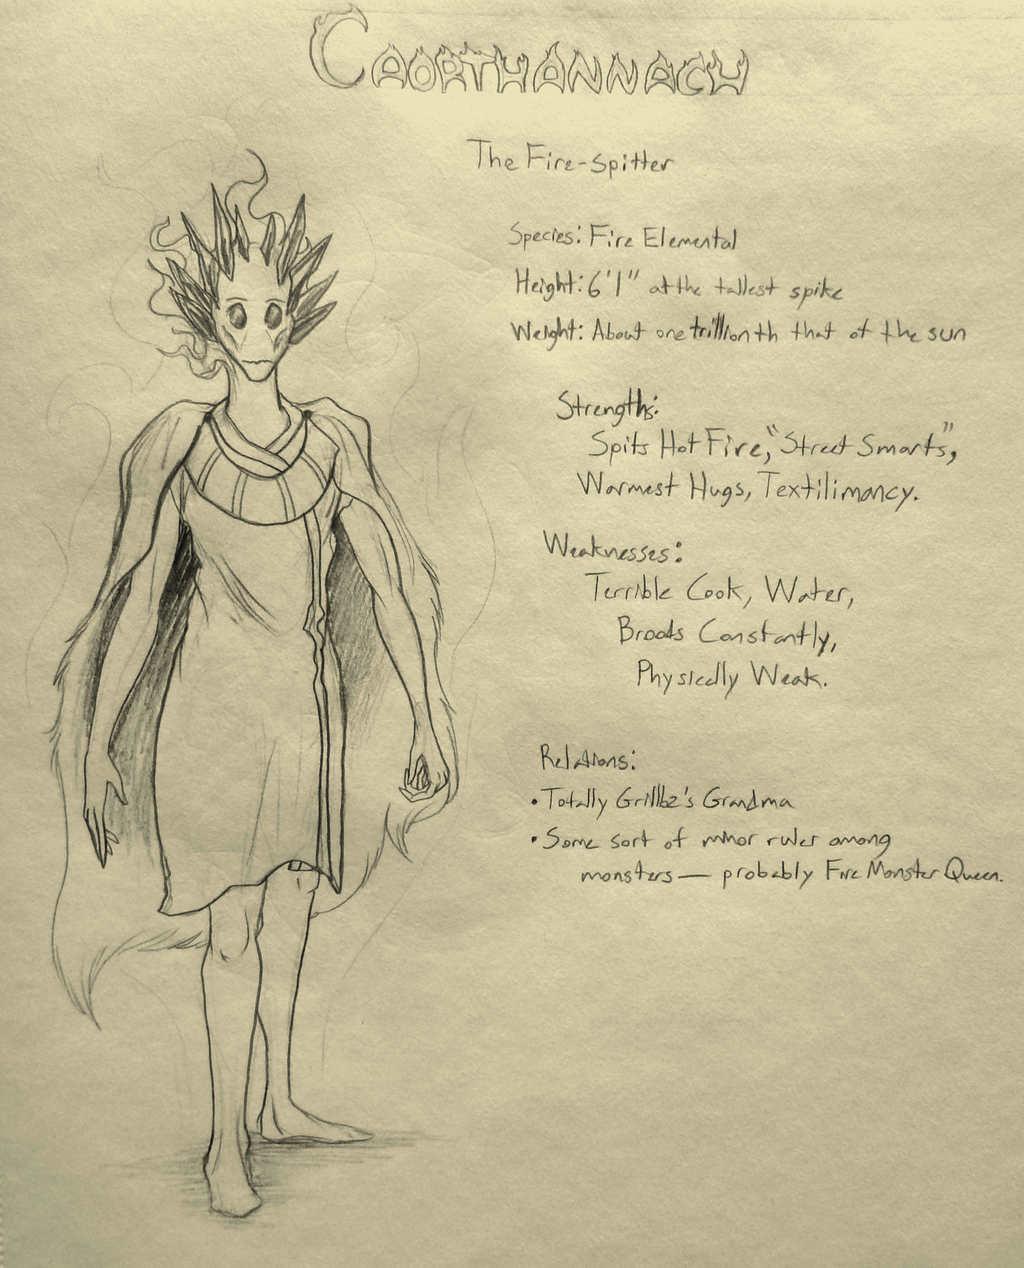 CAORTHANNACH Character Sheet